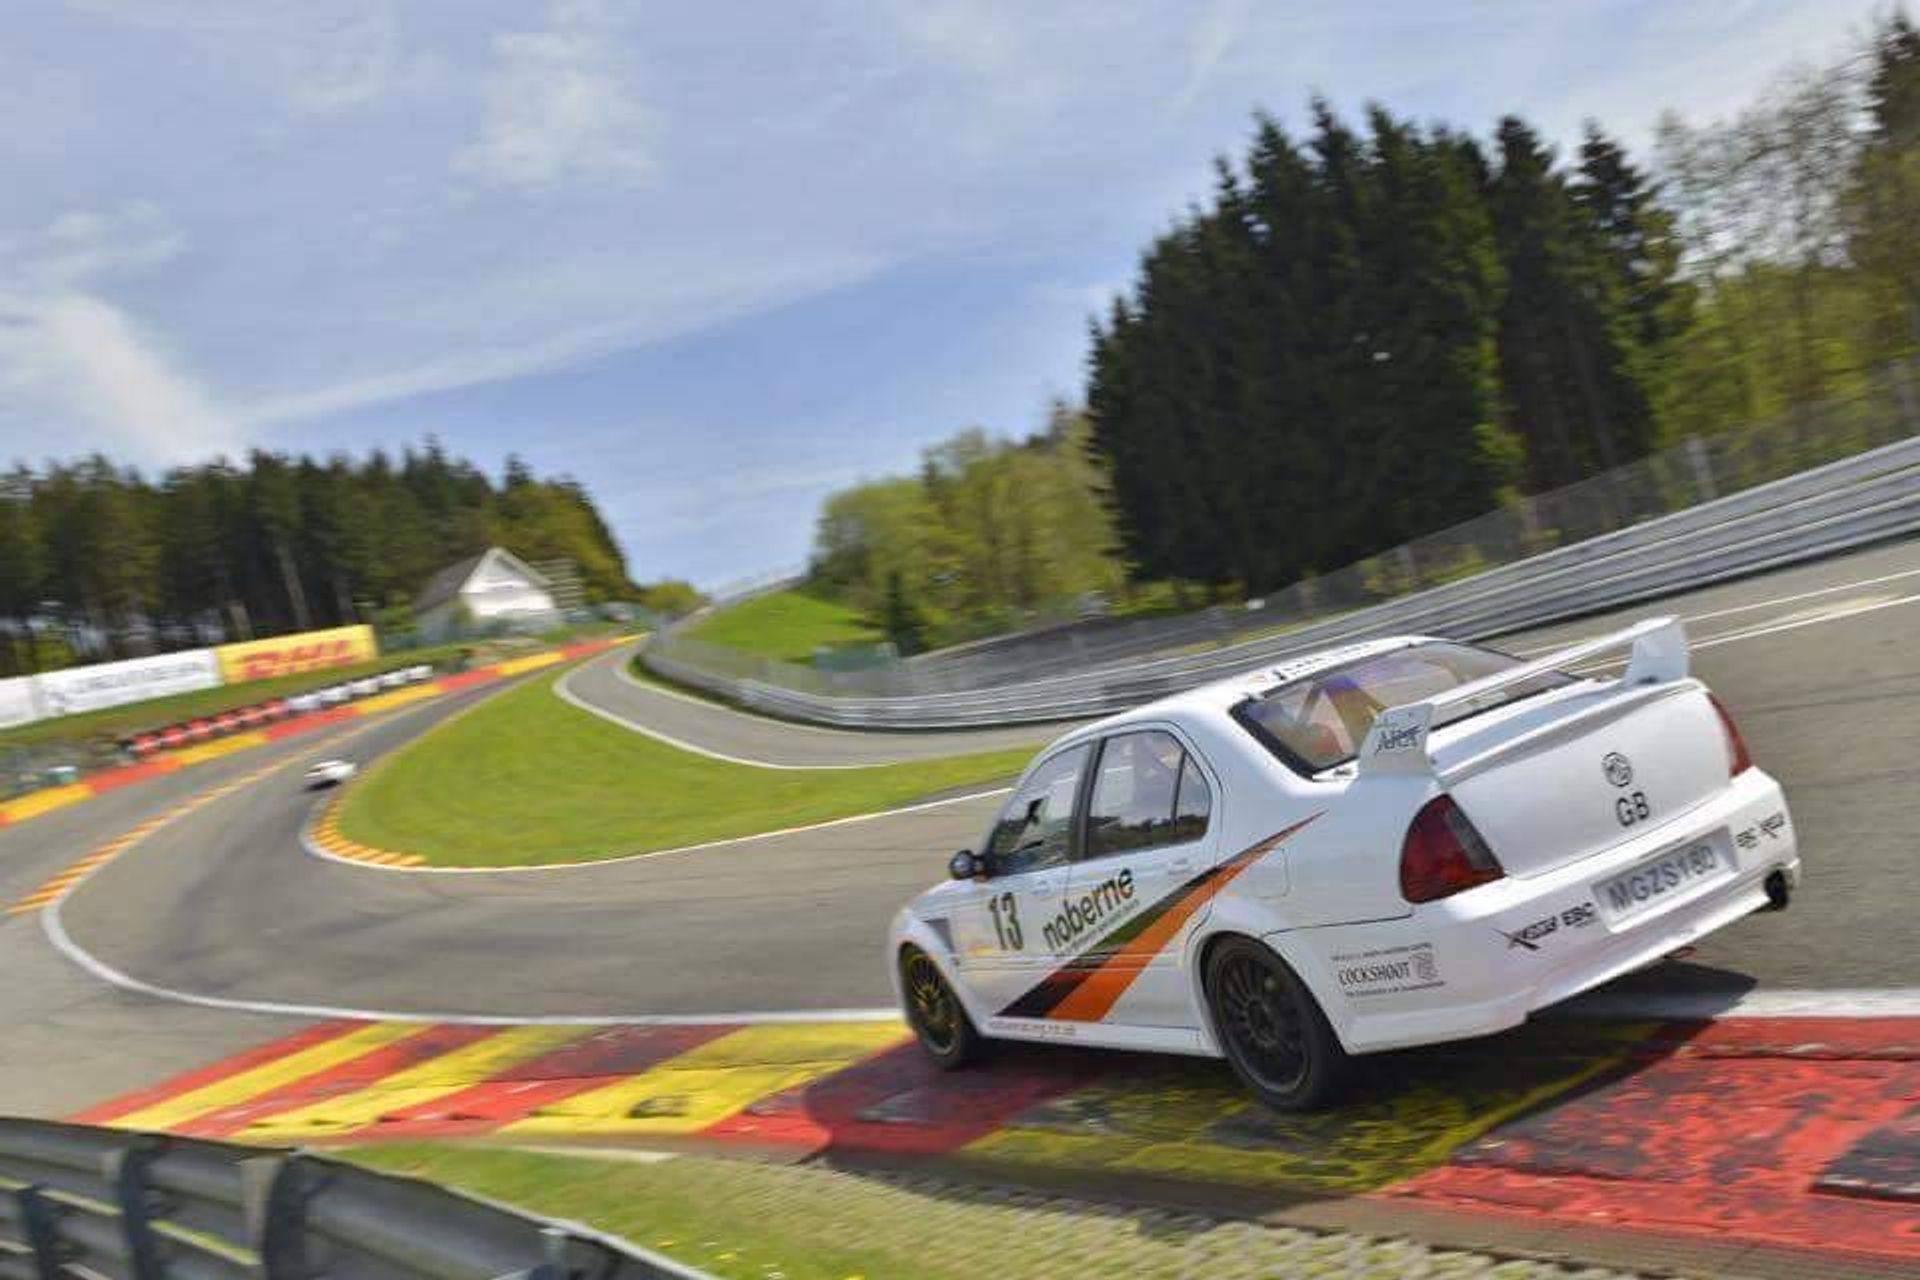 MGZS V6 180 Race Car Vulcan Racing SPA Peter Burchill